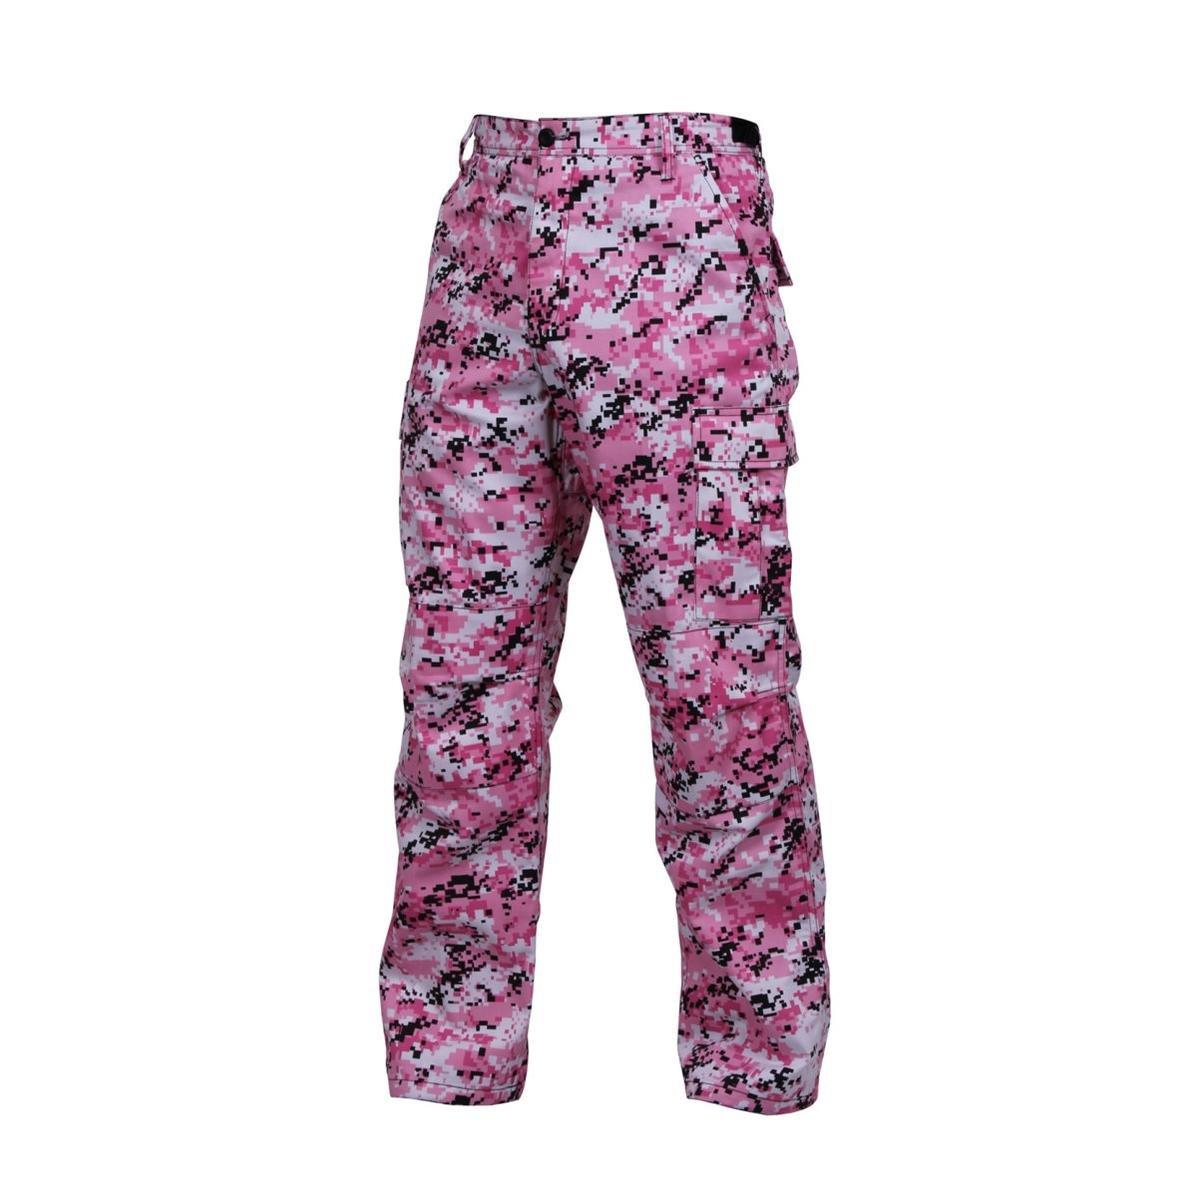 Rothco Bdu Pant, Pink Digital Camo, X-Large 613902996090